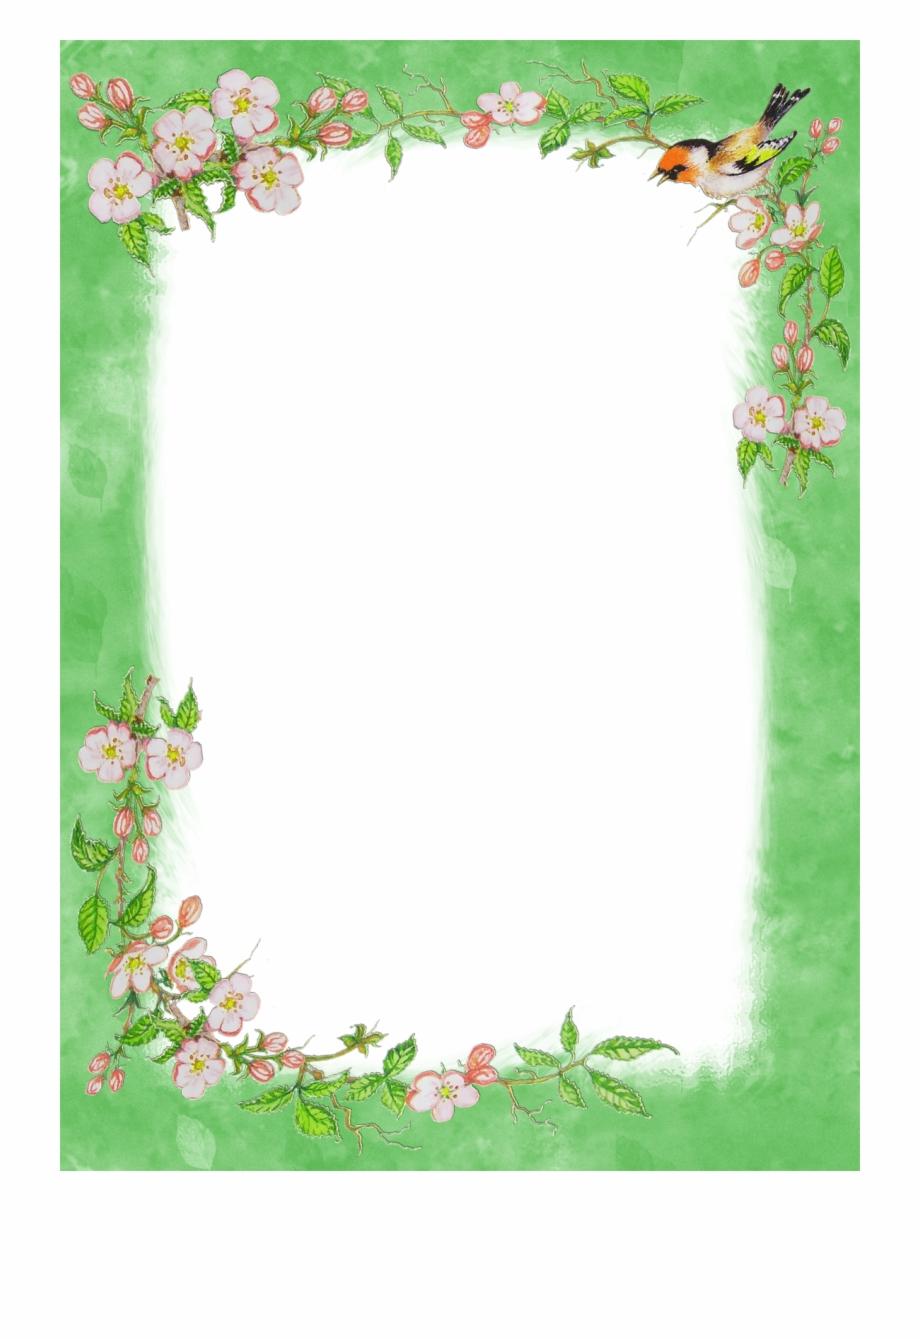 bingkai picture frame transparent png download 1417730 vippng bingkai picture frame transparent